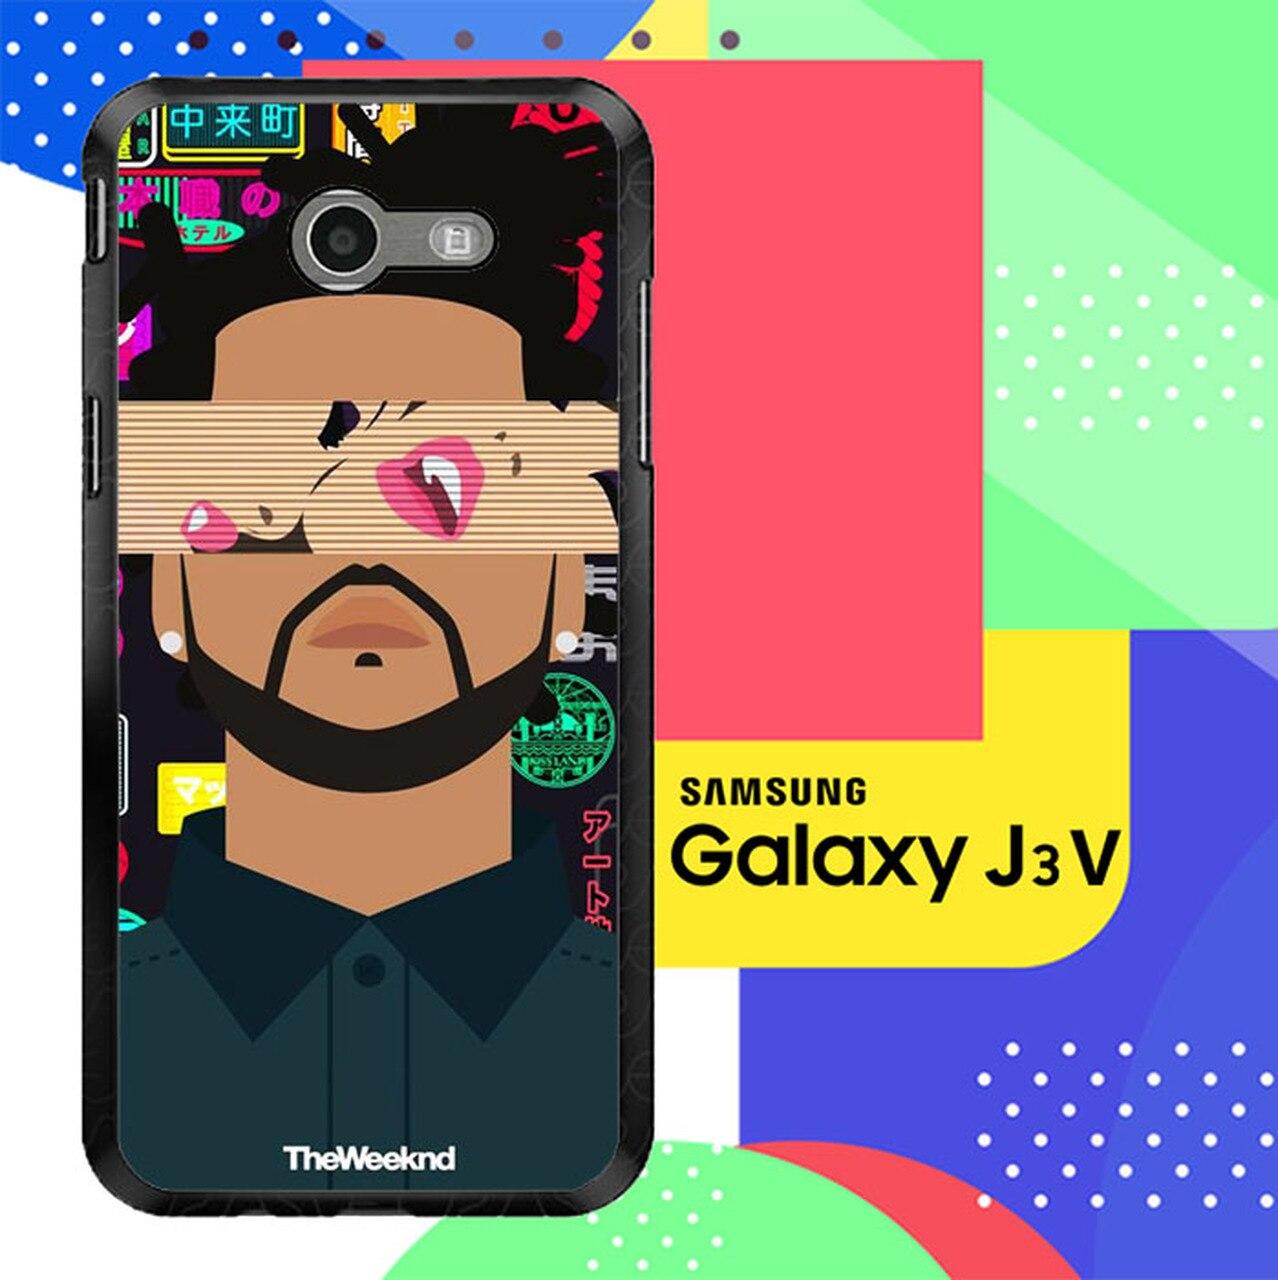 Pokemon Phone Cases For A Galaxy J3 Emerge 1278x1280 Wallpaper Teahub Io